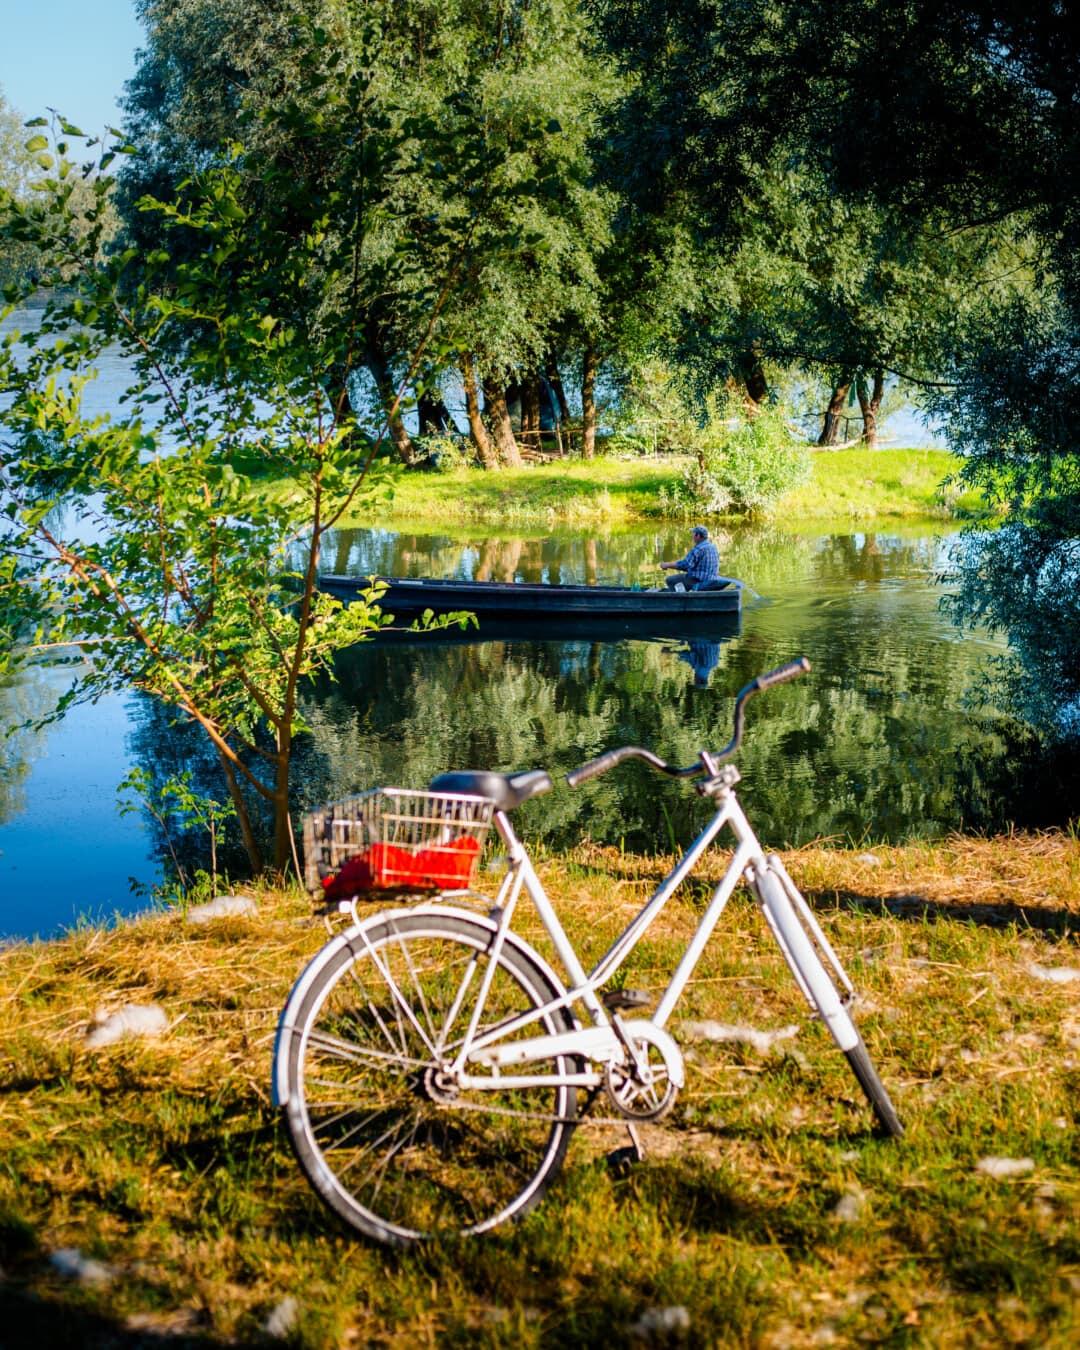 riverbank, river, river boat, man, coast, recreation, bicycle, wheel, mountain bike, cycling